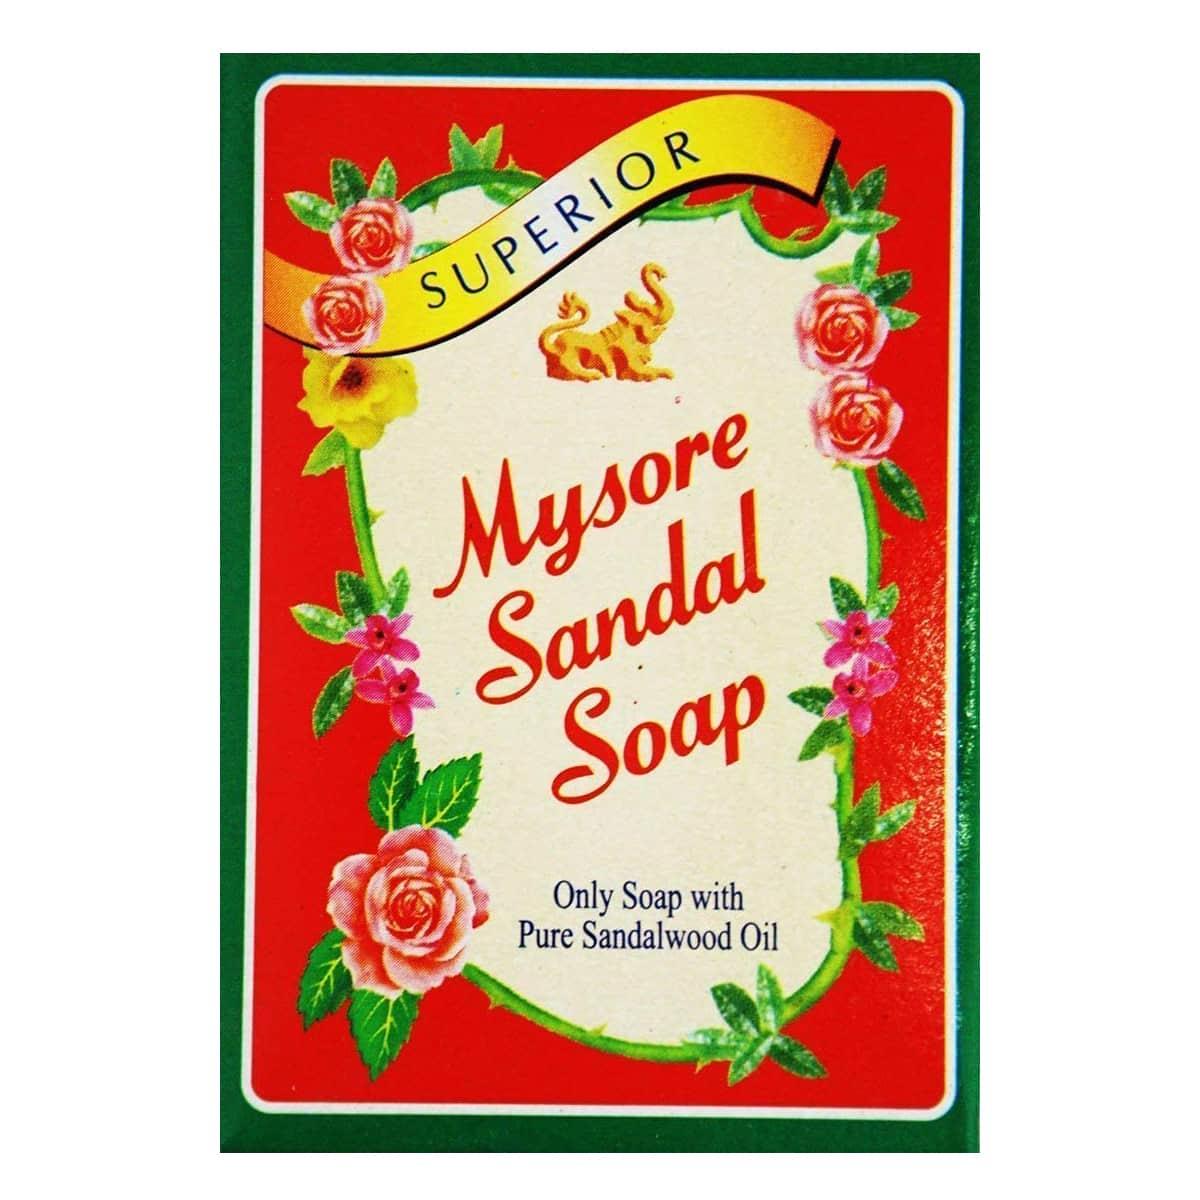 Buy Mysore Sandal Soap with Pure Sandalwood Oil - 75 gm